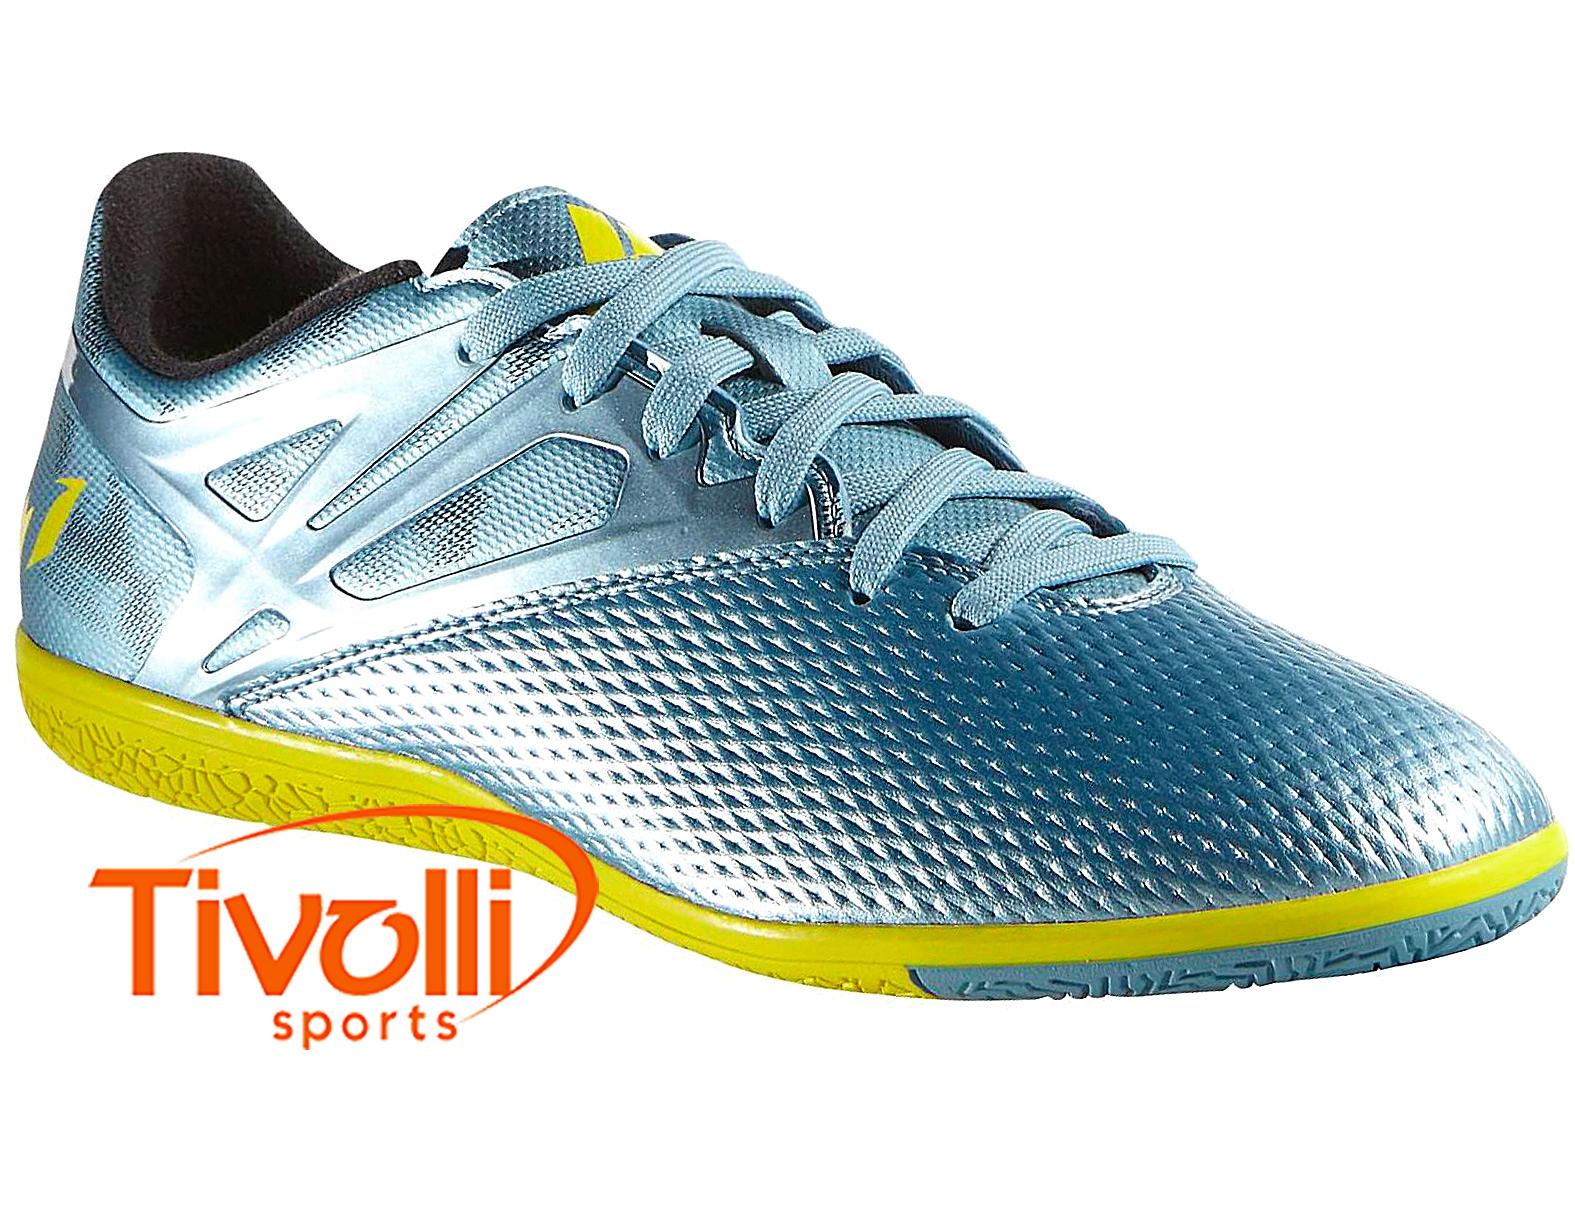 Chuteira Adidas Messi 15.3 IC Futsal   - Mega Saldão   73a4add444571